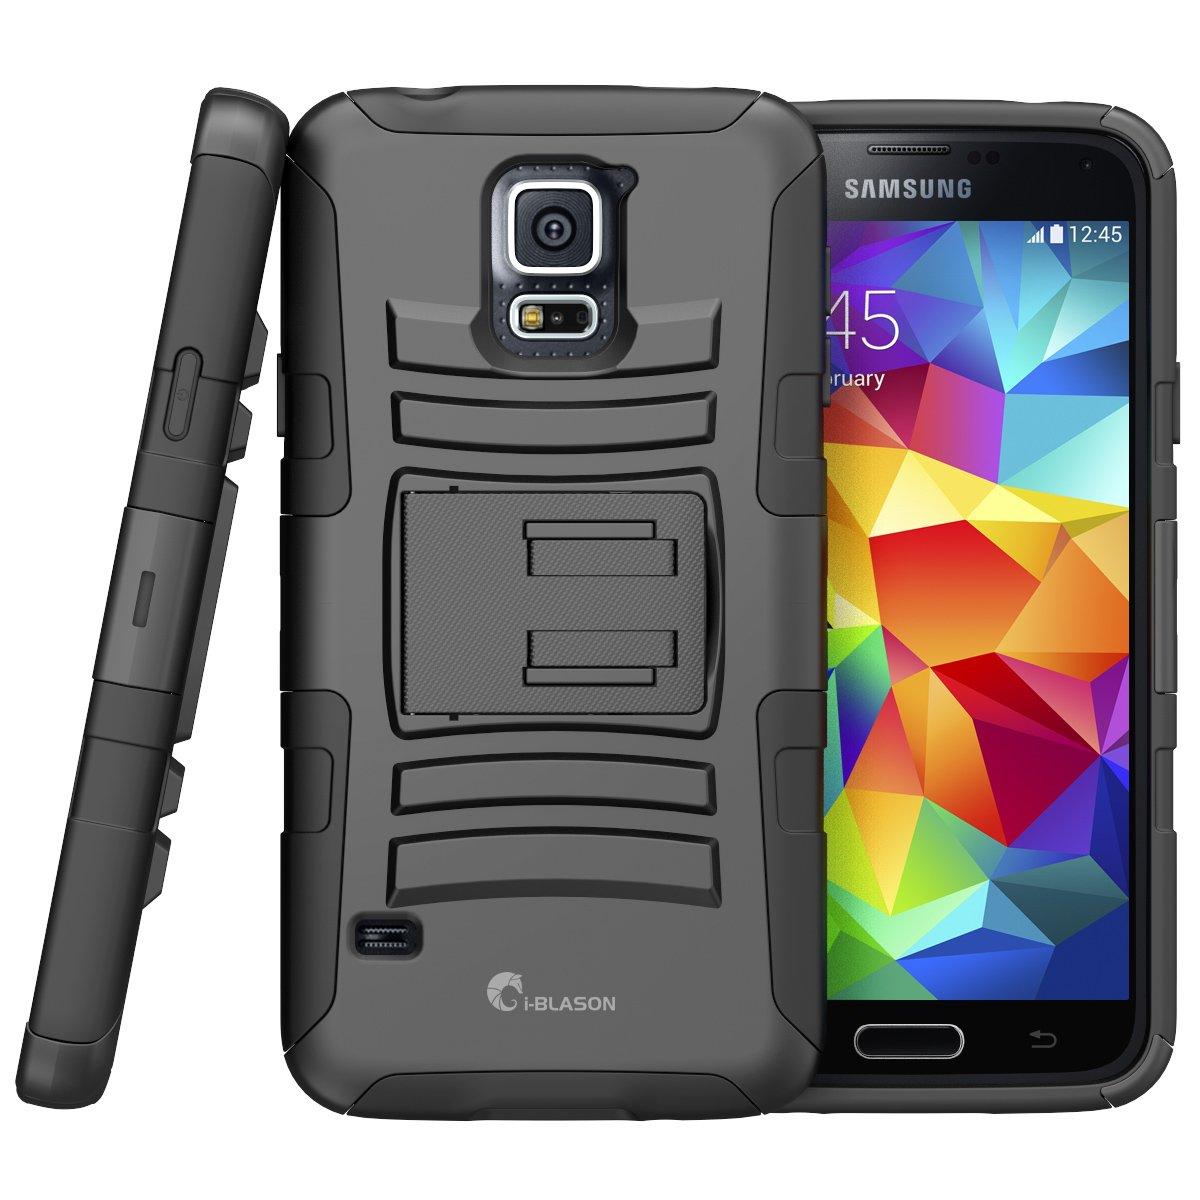 i-Blason Samsung Galaxy S5 Case - Prime Series Dual Layer Holster Case with Kickstand and Locking Belt Swivel Clip (Samsung Galaxy S5, Black)